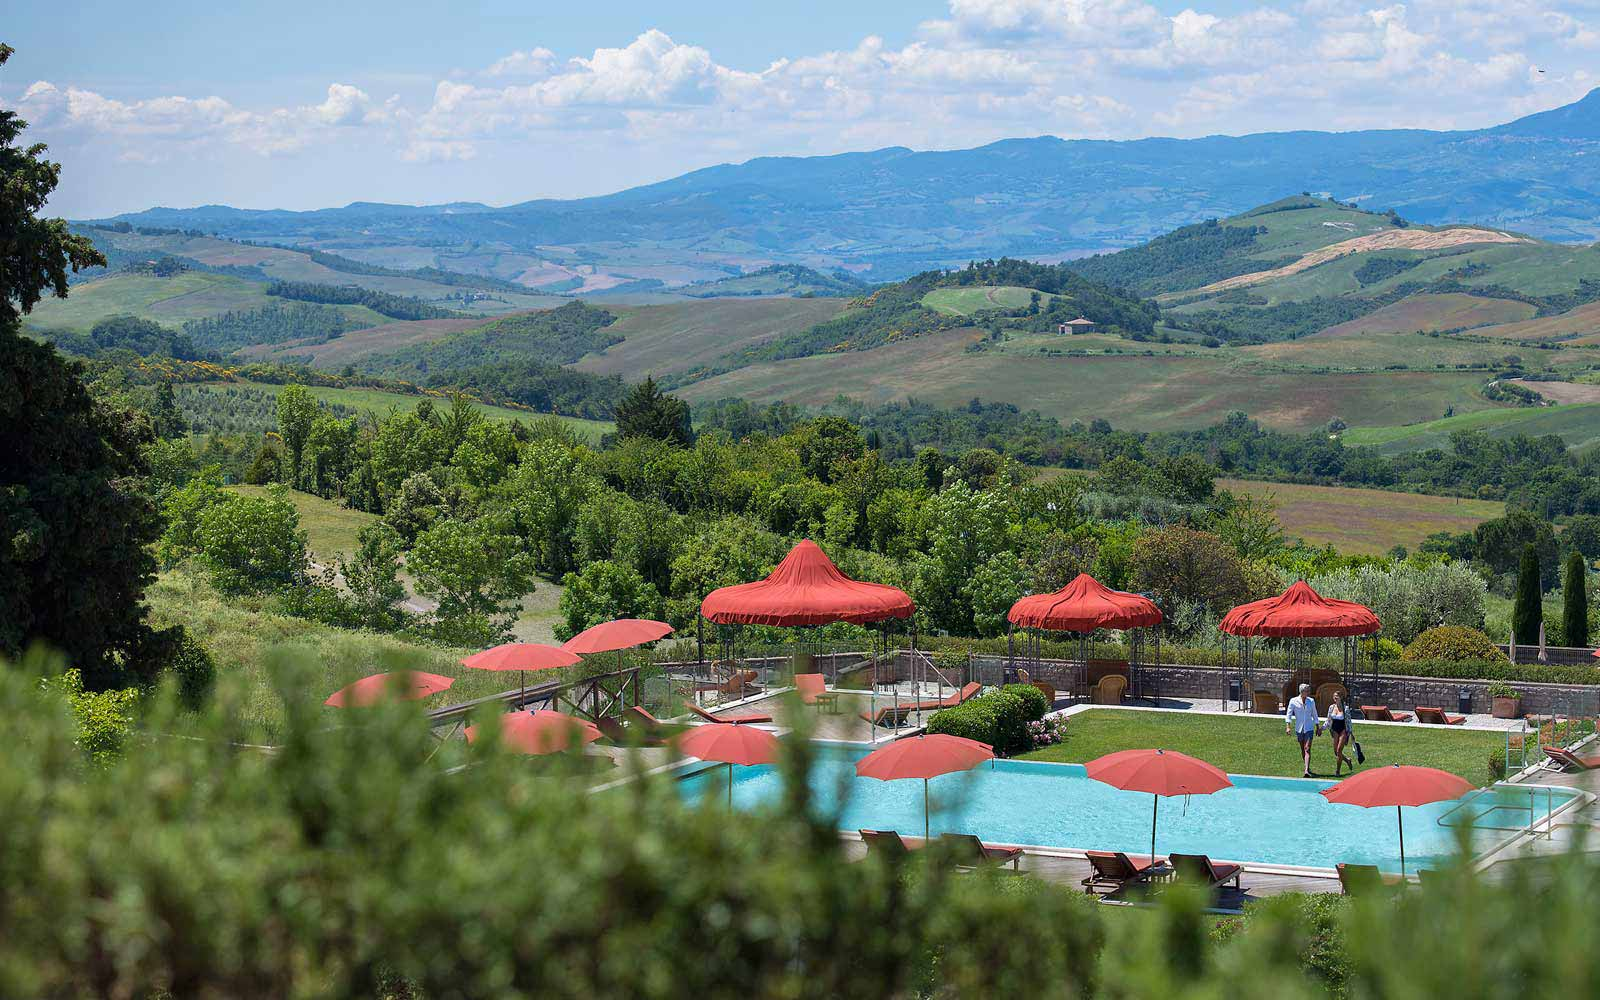 Fonteverde valley view